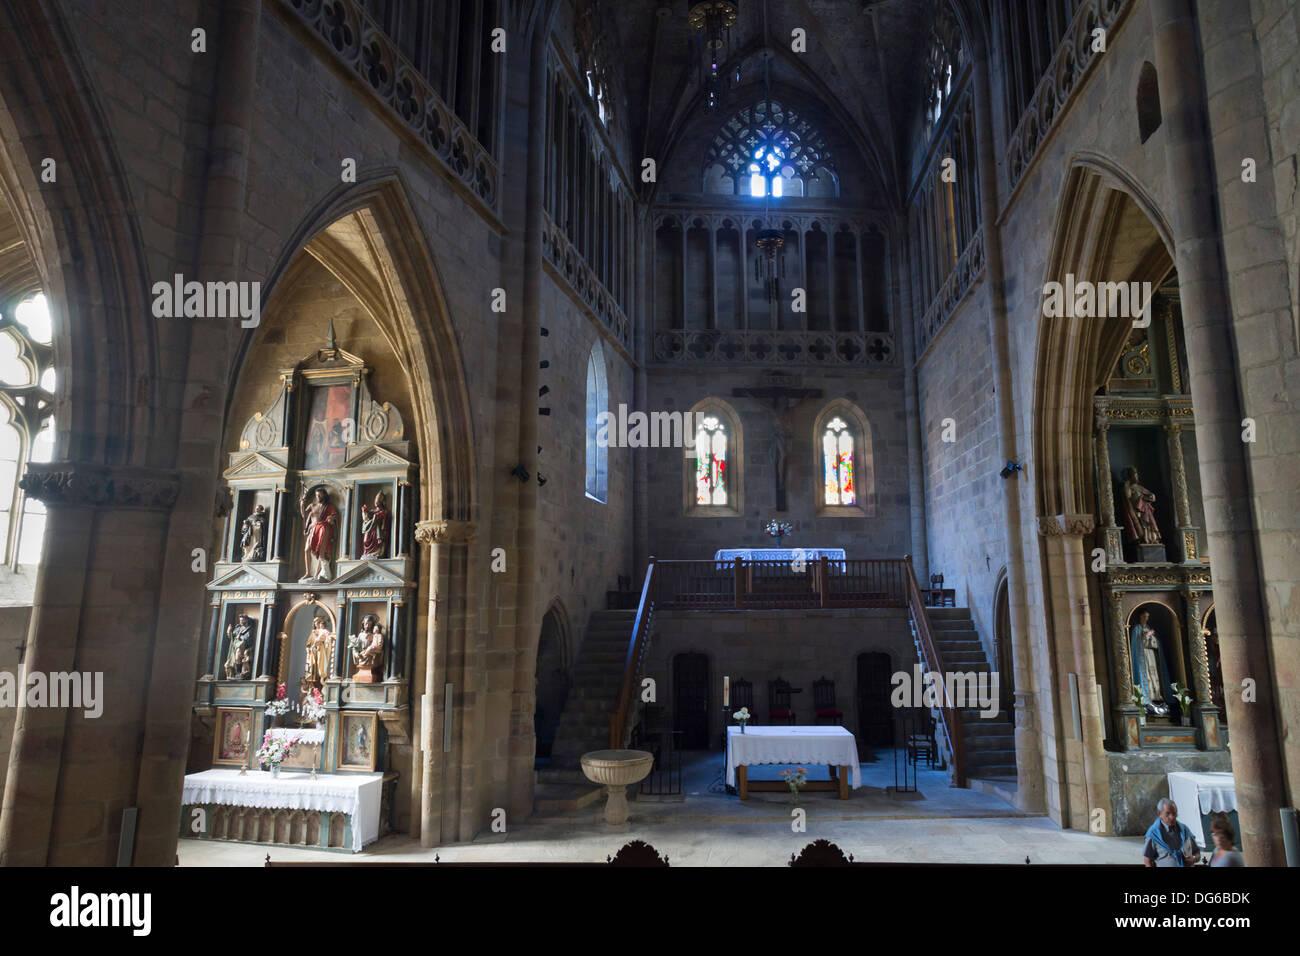 Basque country, Euskadi - seaside fishing town and resort of Getaria. Church of San Salvador. Interior. - Stock Image